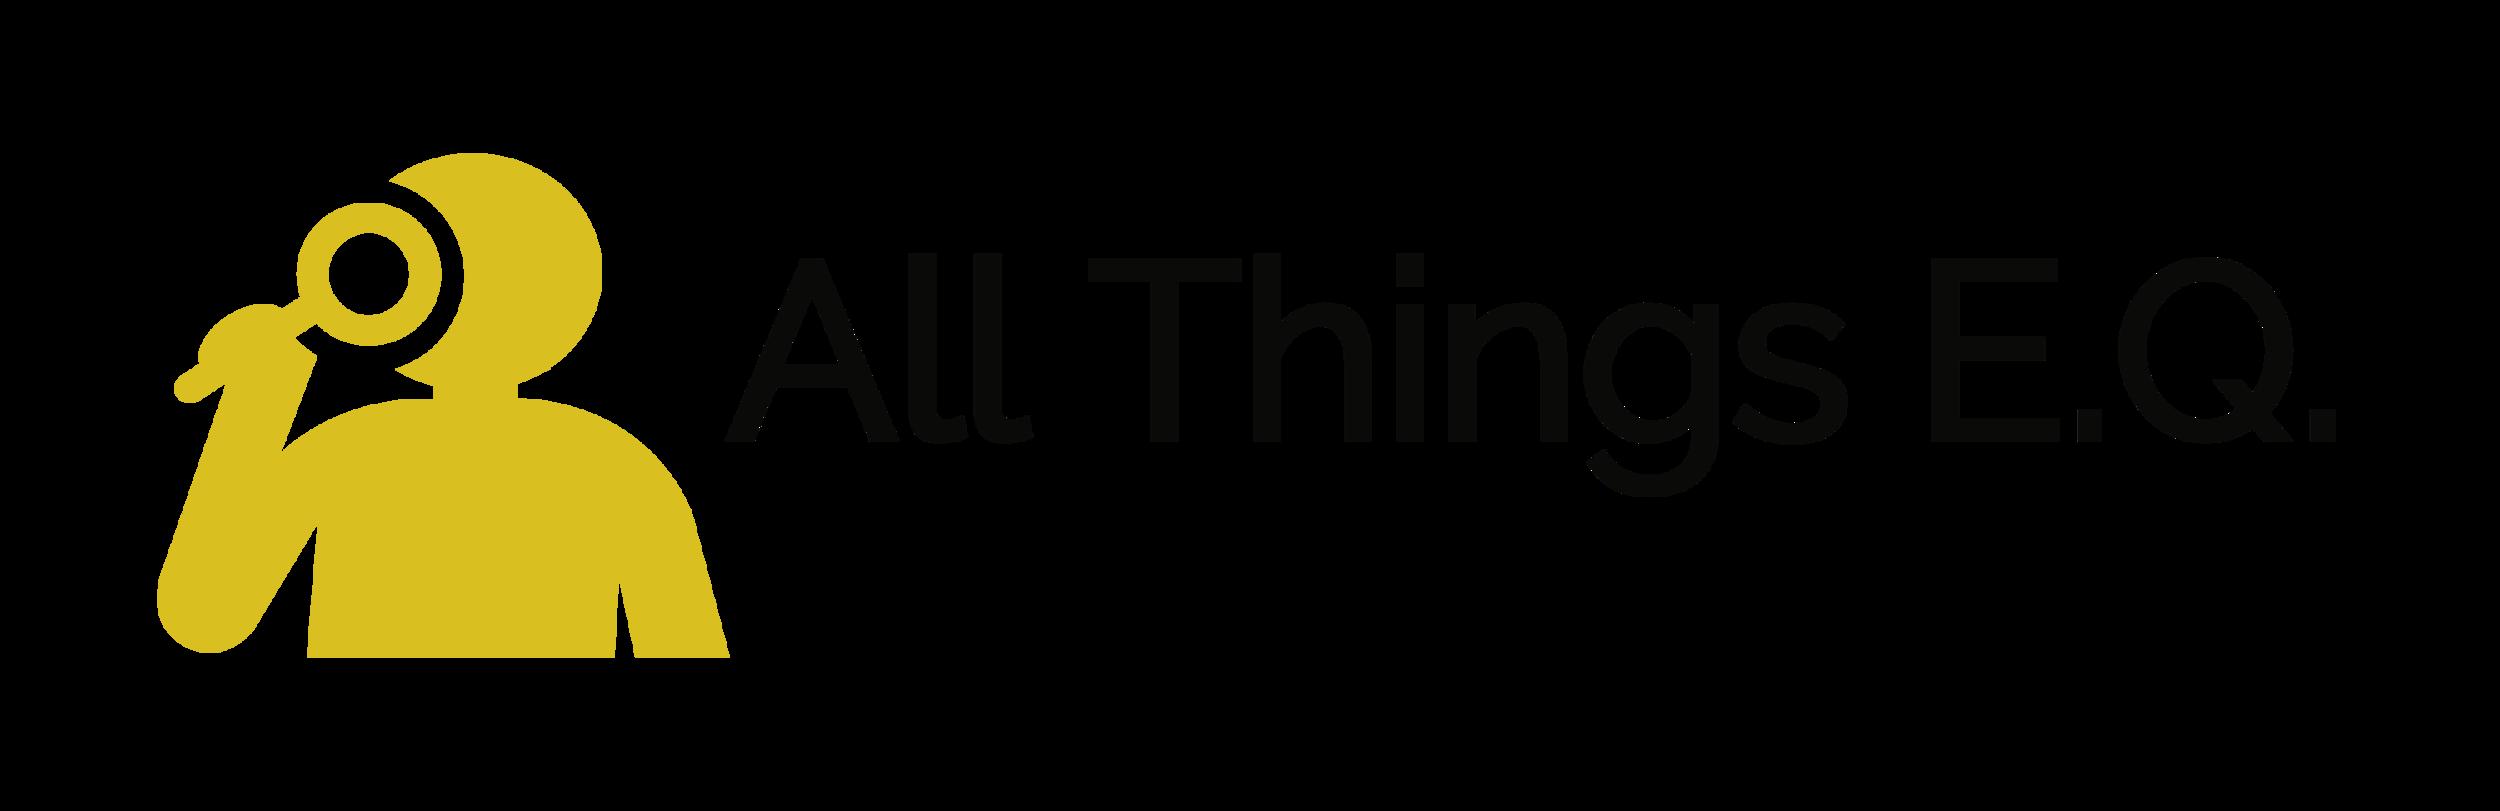 All Things E.Q.-logo.png